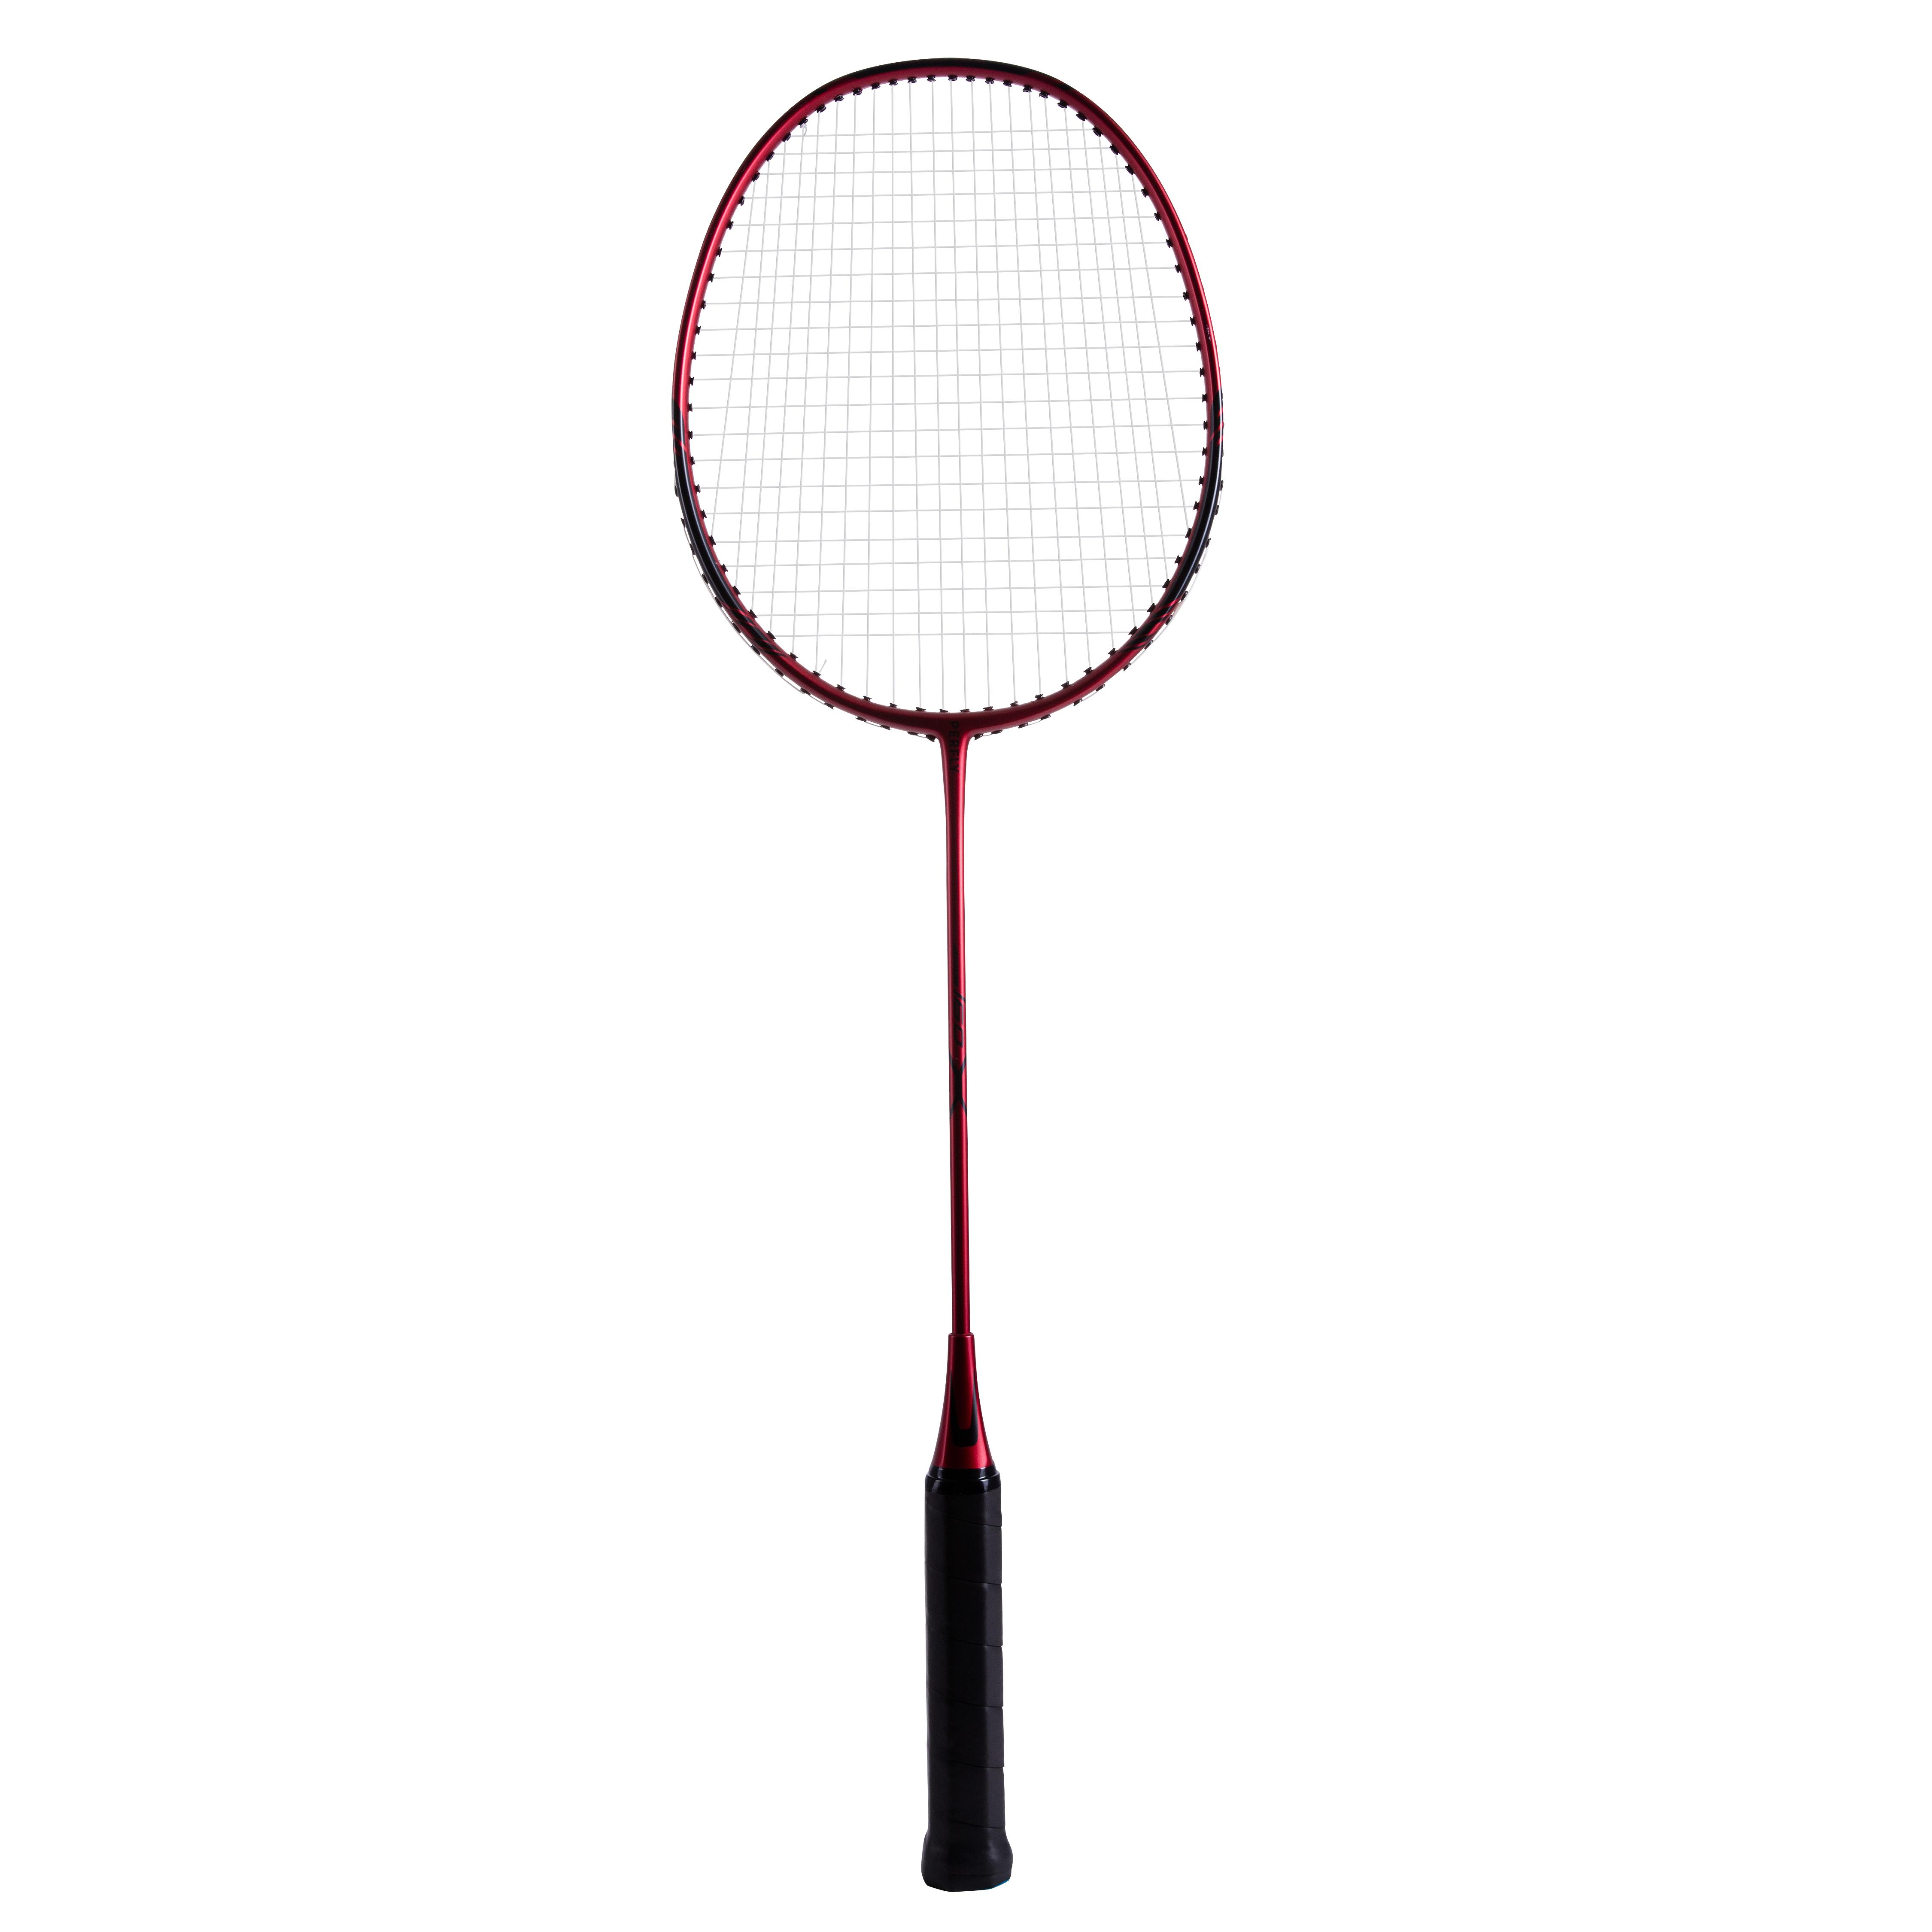 Rachetă badminton BR 160 P la Reducere poza